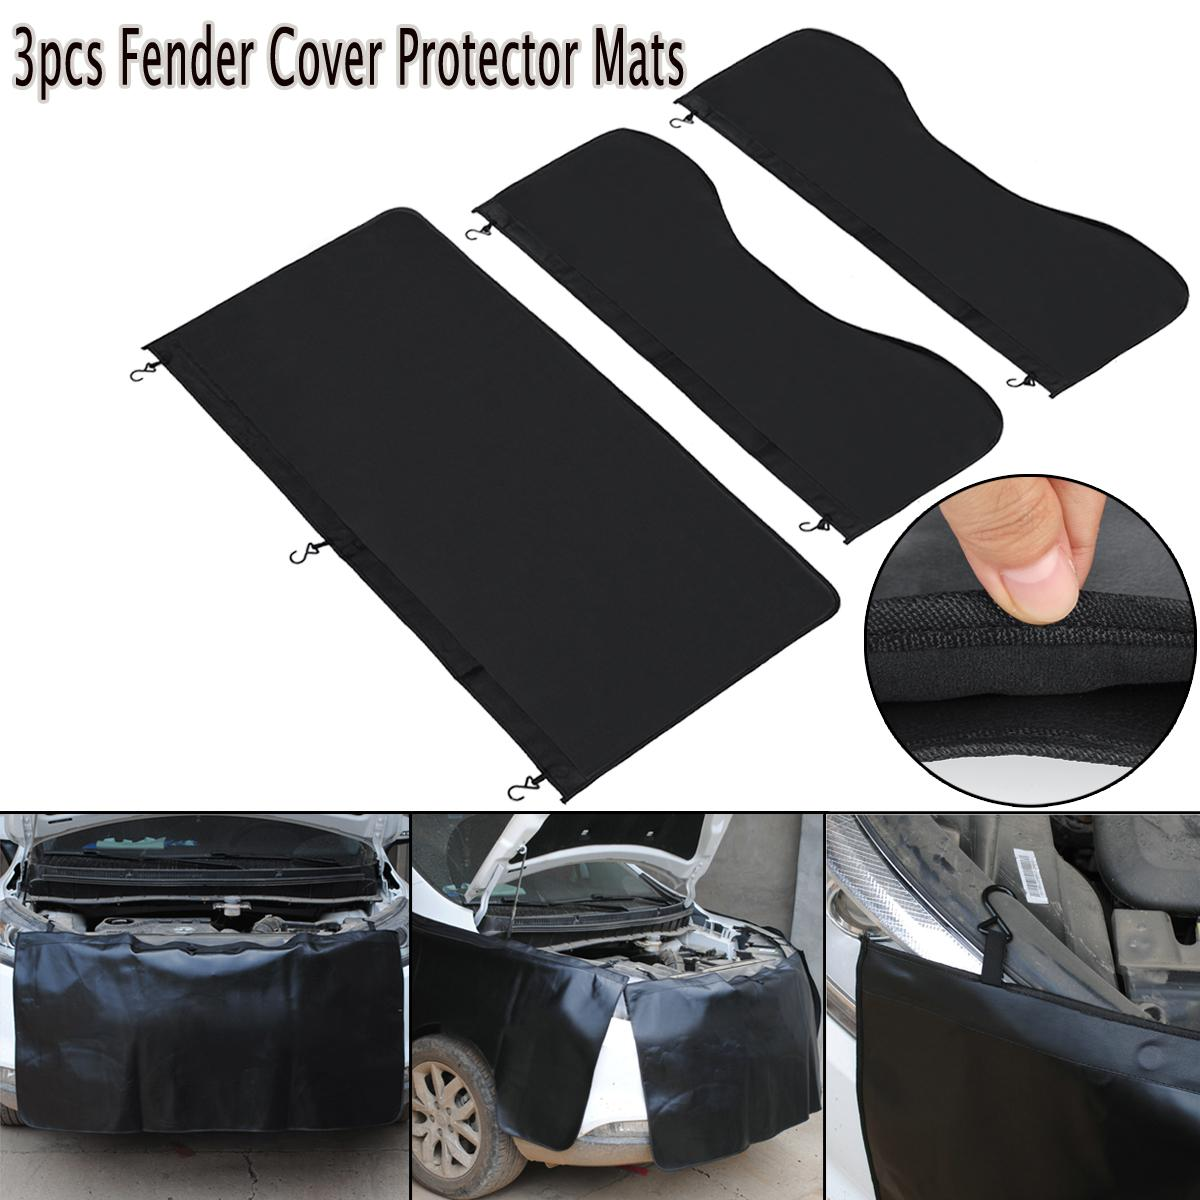 3 stücke Universal Auto Magnetic für Fender Cover Protector Mechaniker Arbeitsmatte Auto Reparatur Pad